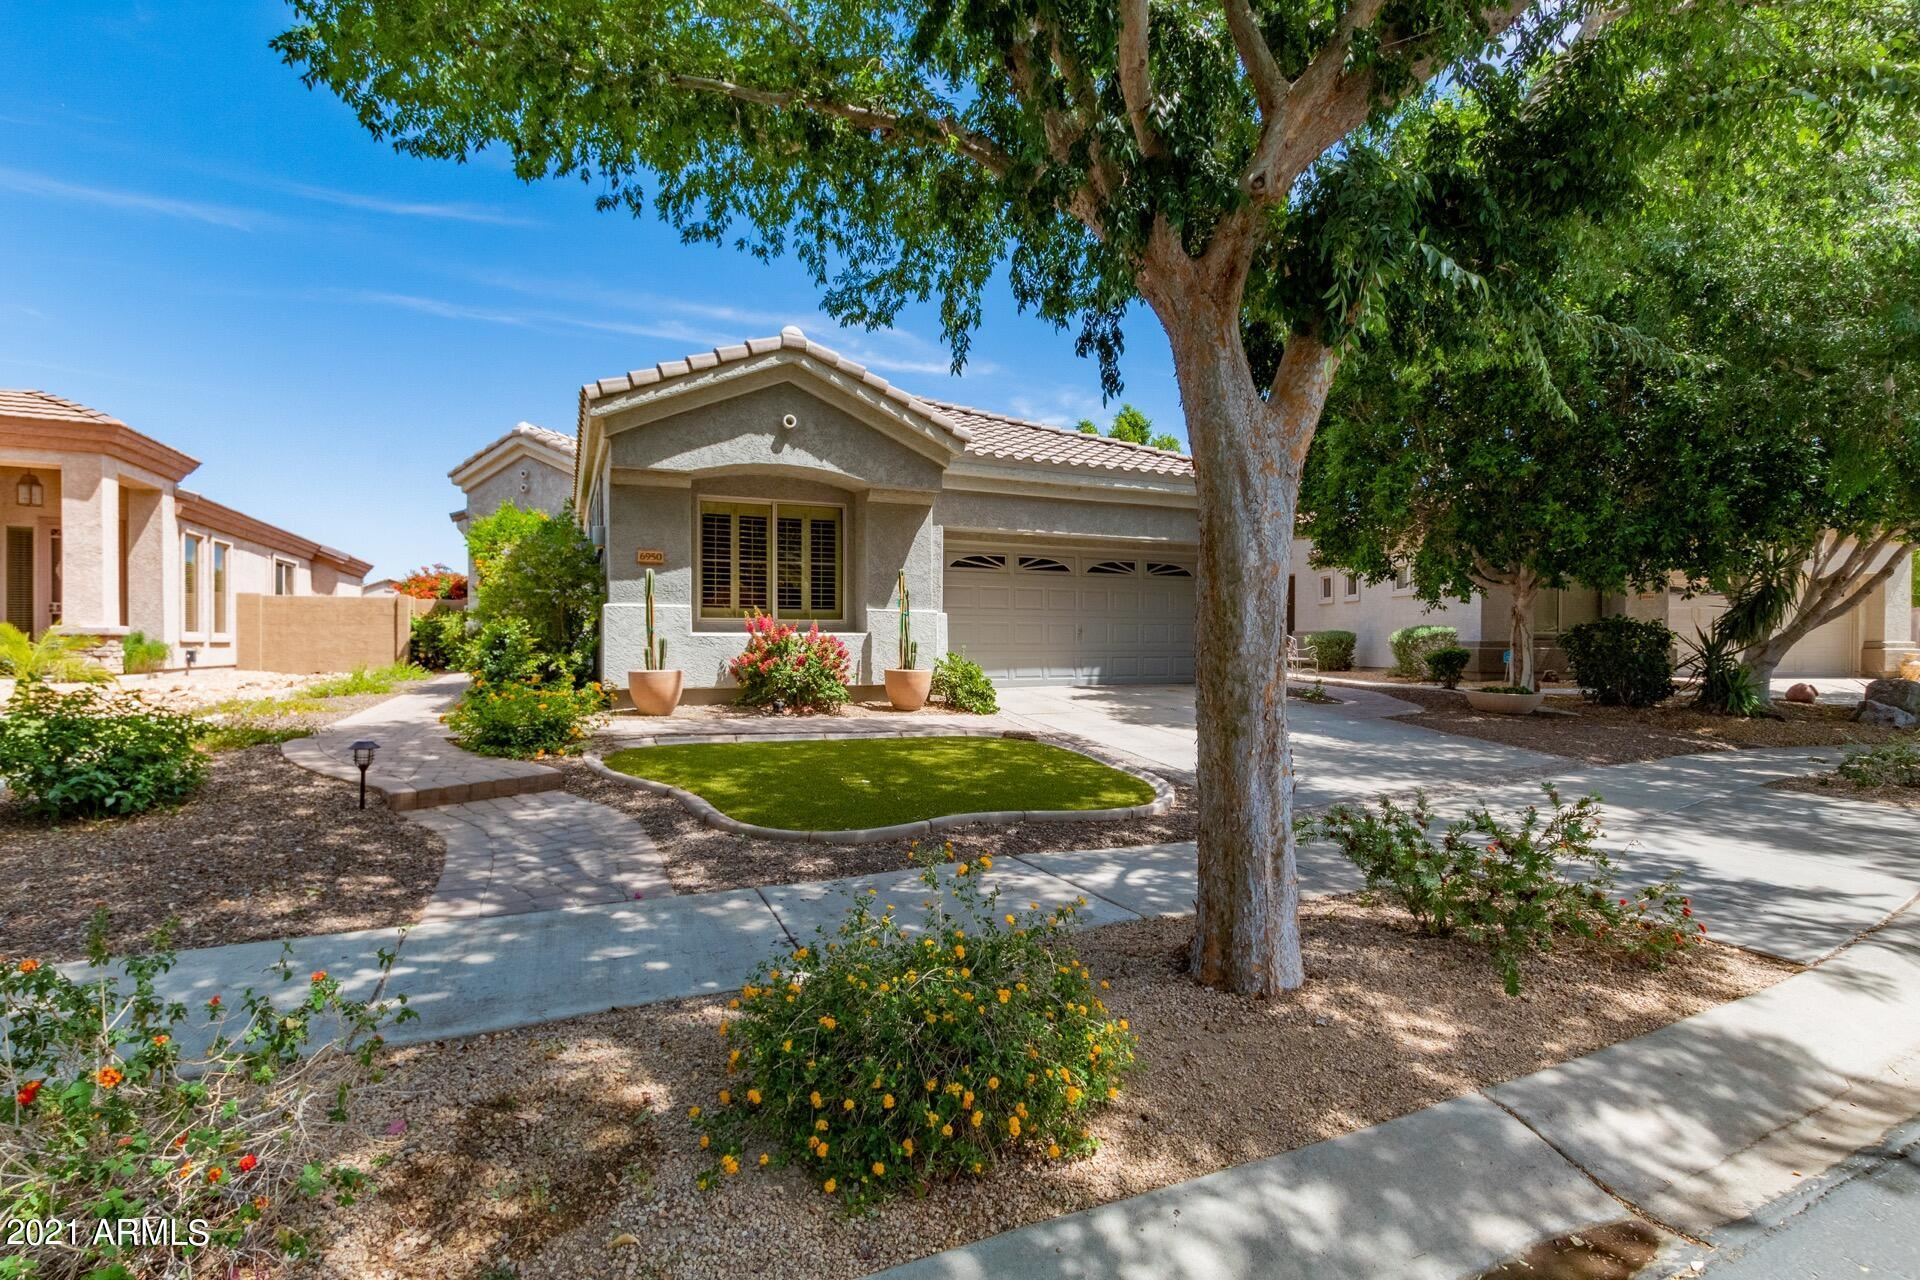 Photo of 6950 W ROSE GARDEN Lane, Glendale, AZ 85308 (MLS # 6233679)